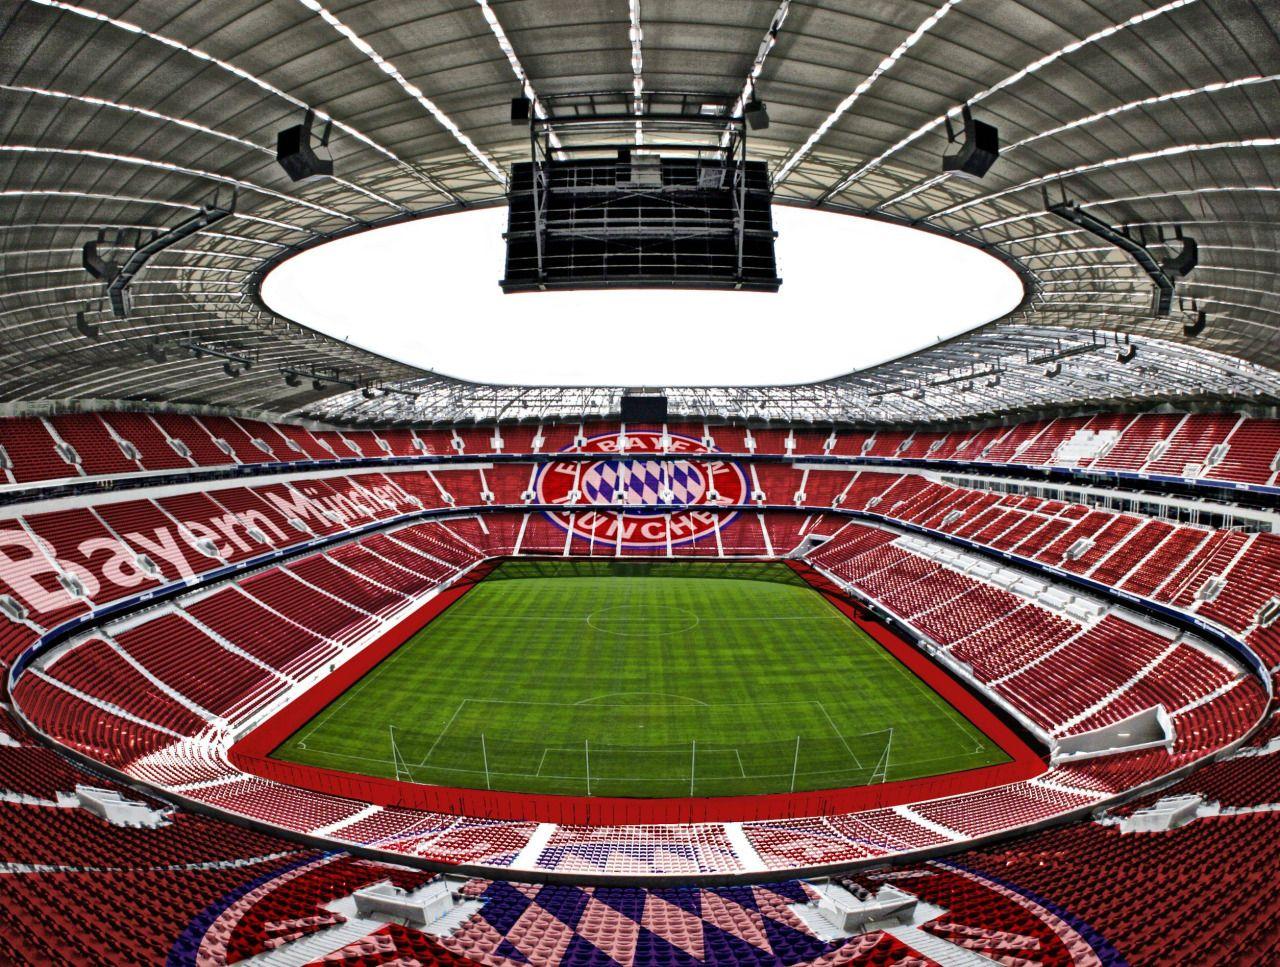 allianz arena with red seats bastian schweinsteiger pinterest fc bayern m nchen bayern. Black Bedroom Furniture Sets. Home Design Ideas